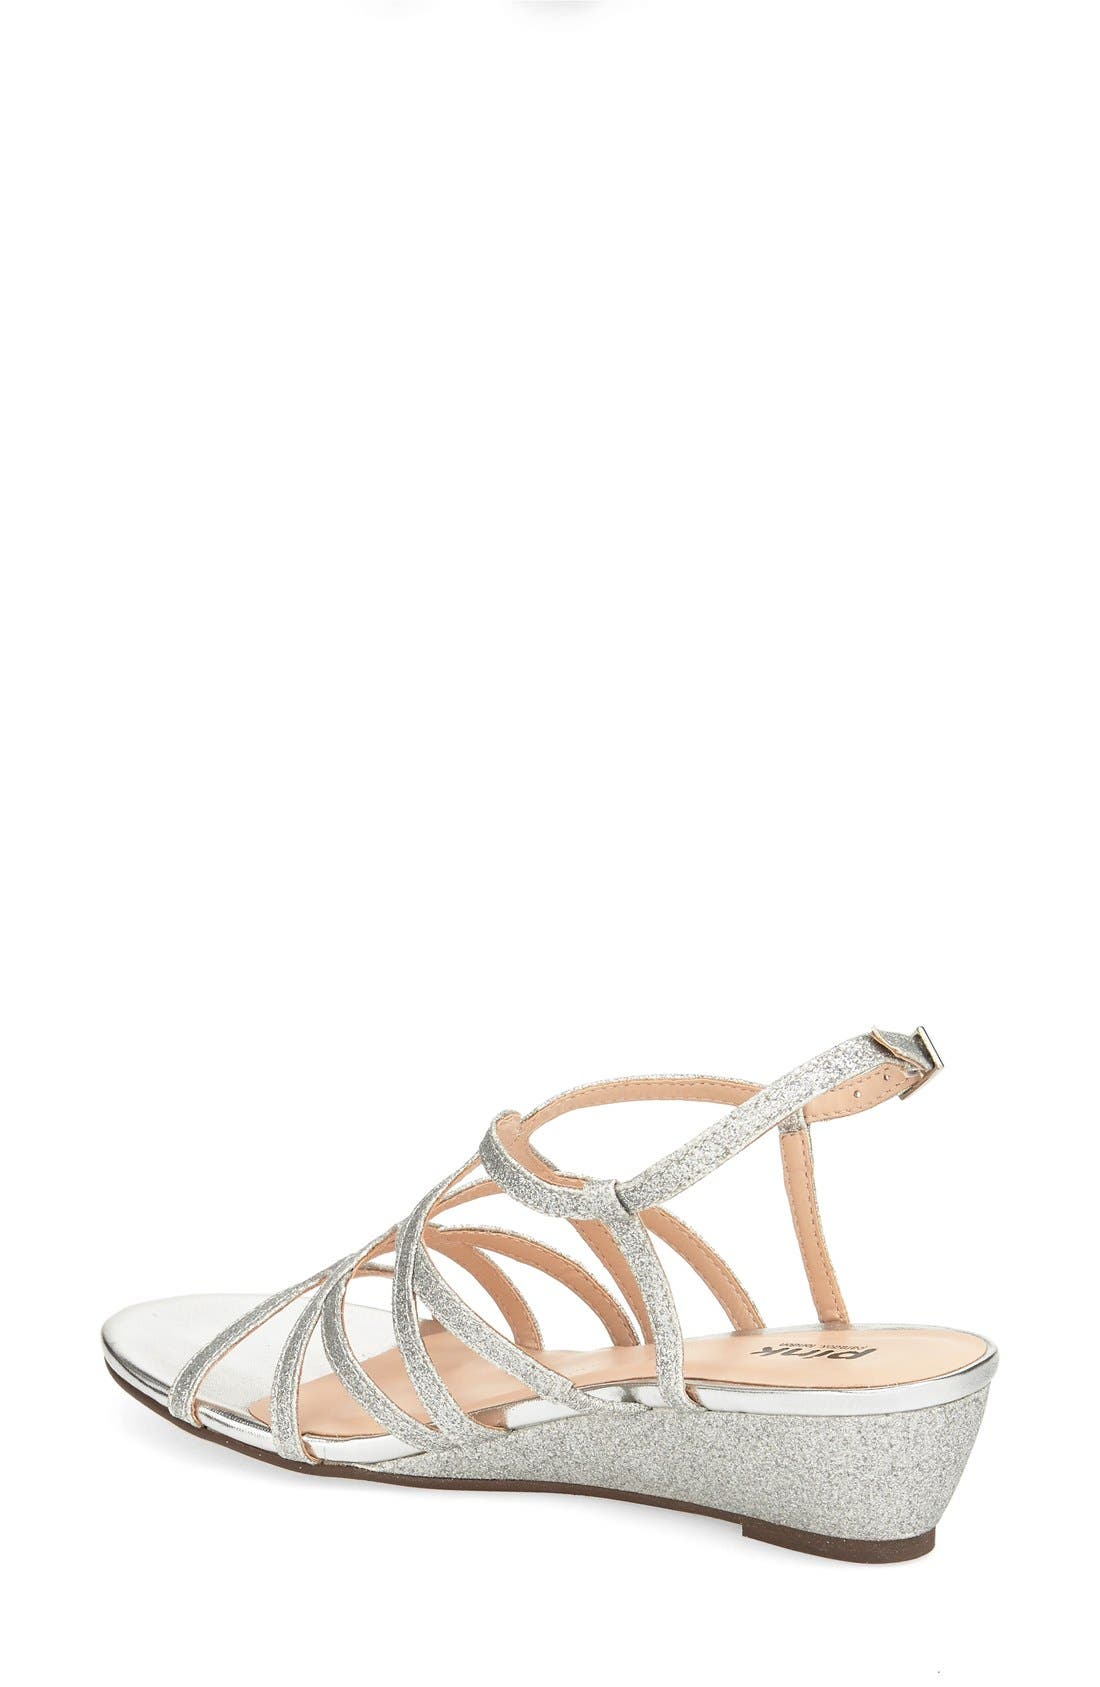 'Opulent' Wedge Sandal,                             Alternate thumbnail 2, color,                             Silver